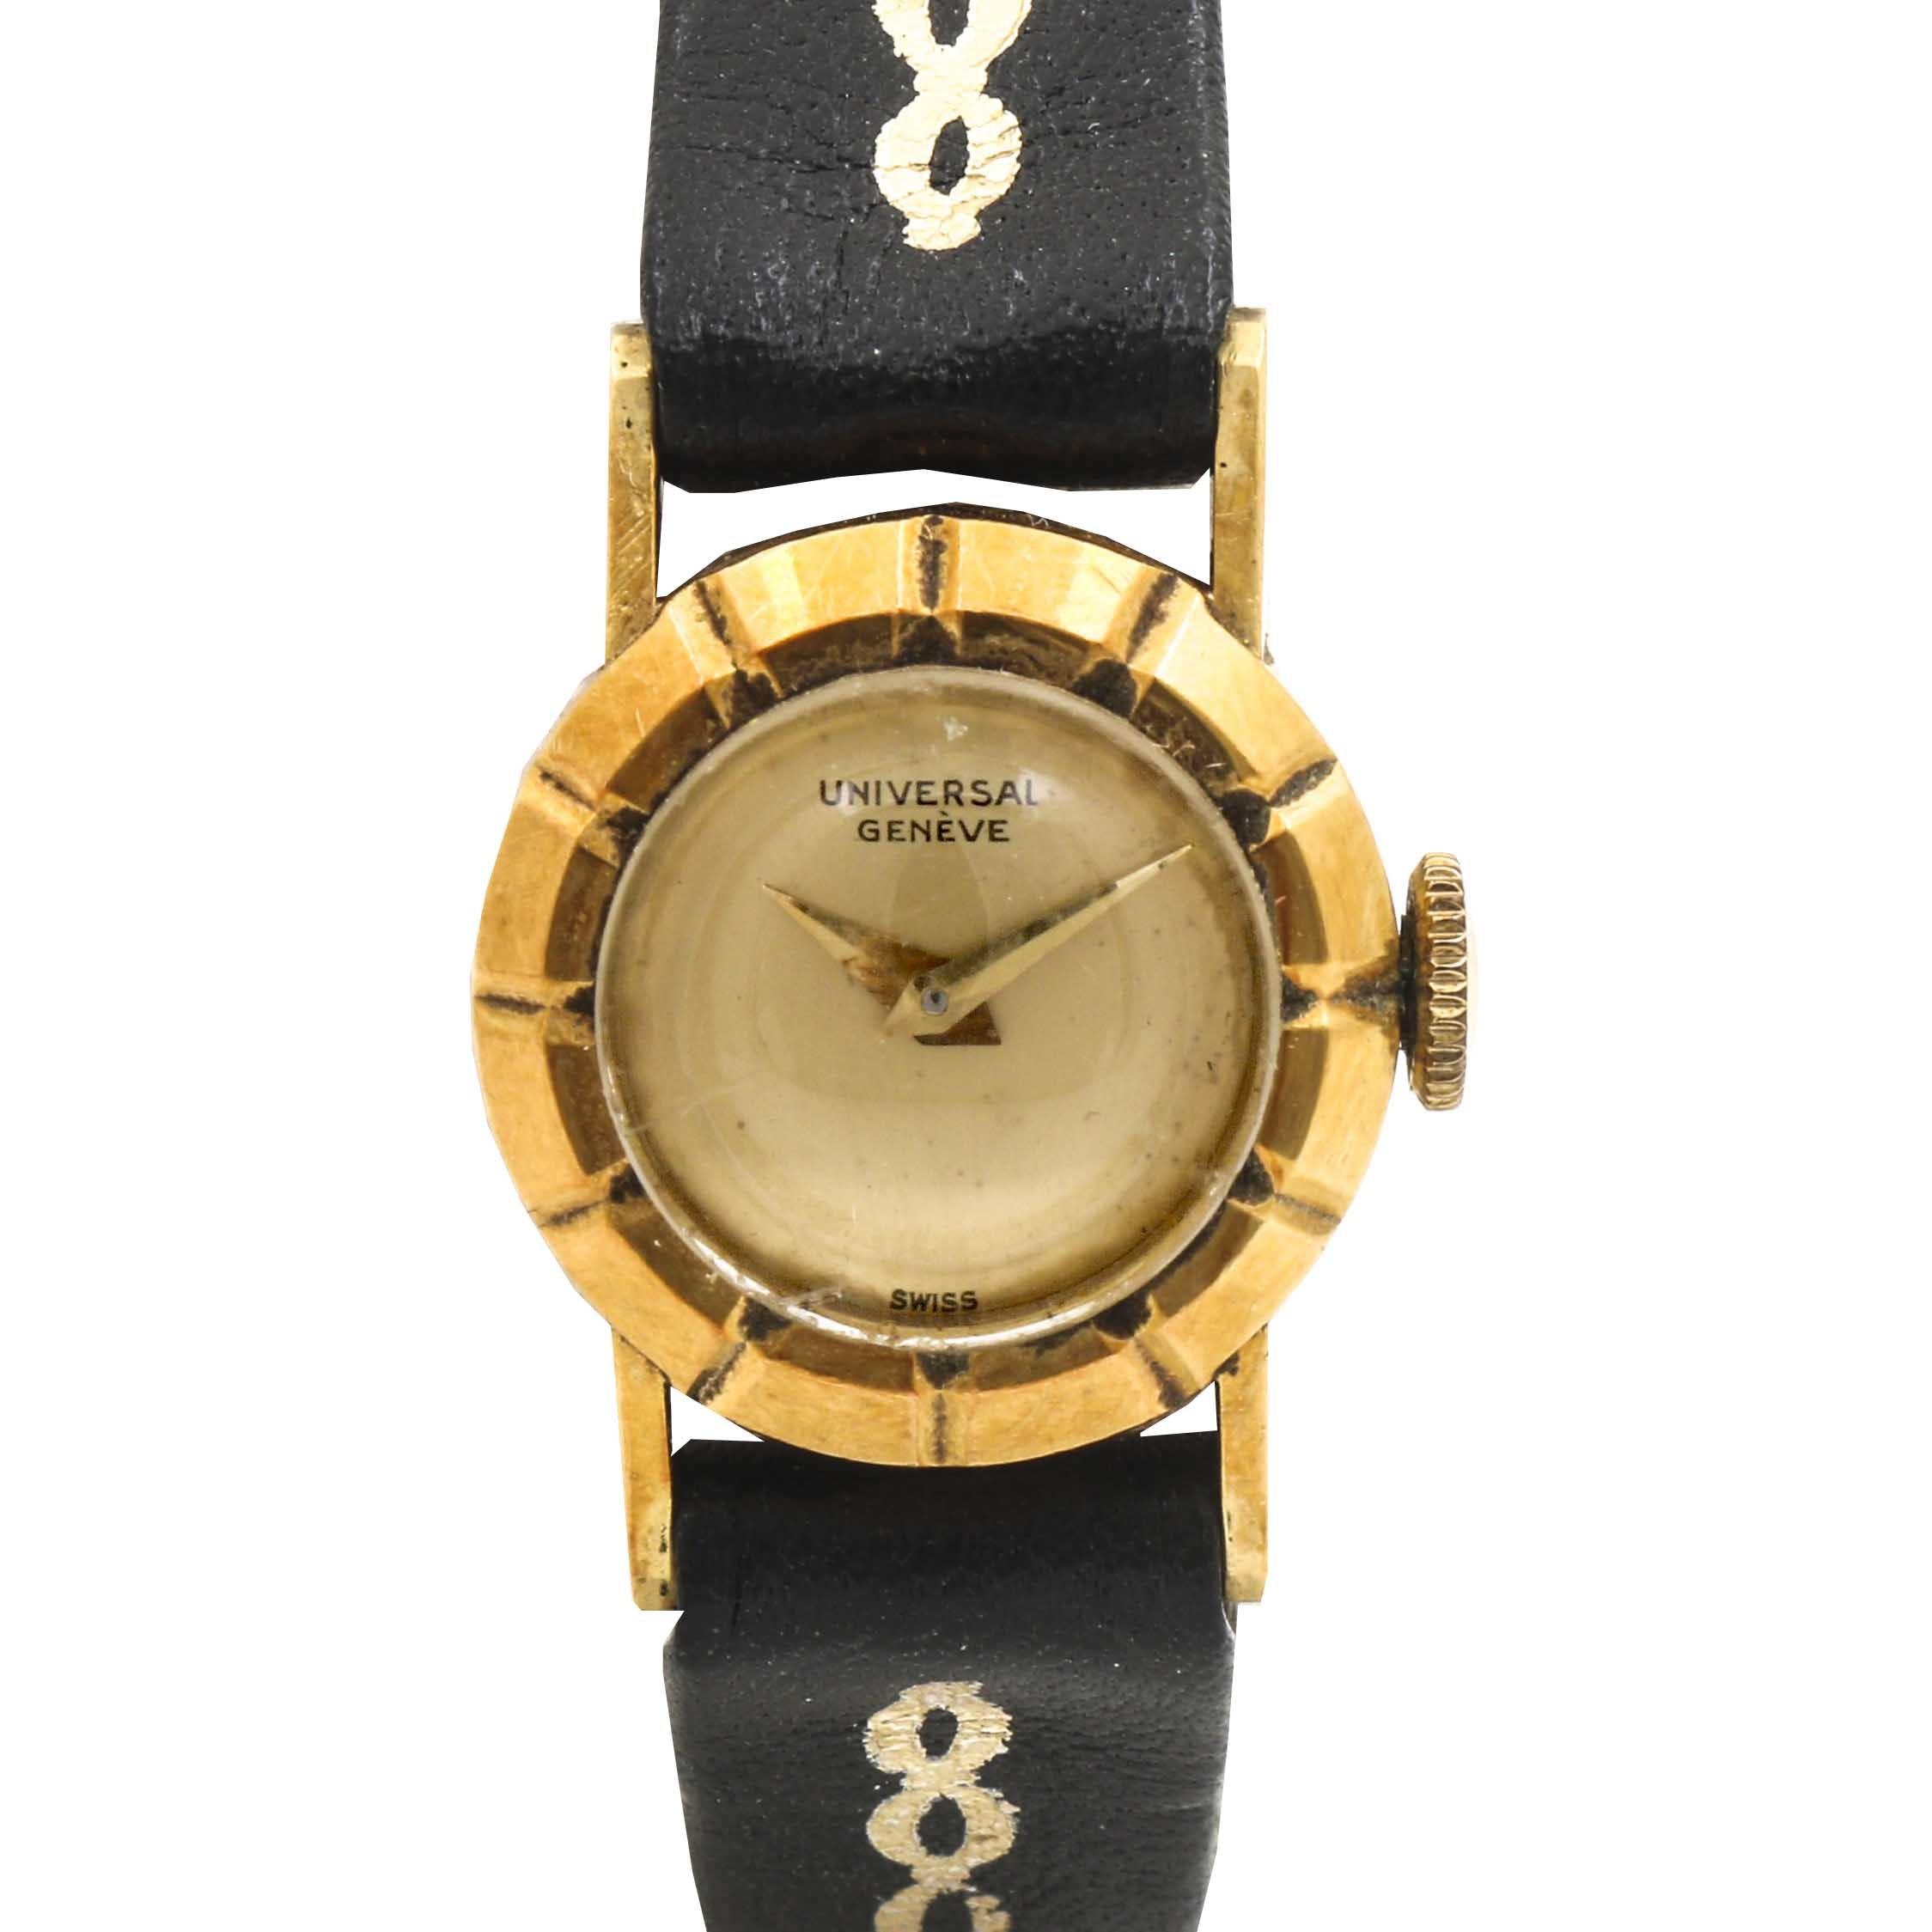 Universal Geneve 18K Yellow Gold Wristwatch